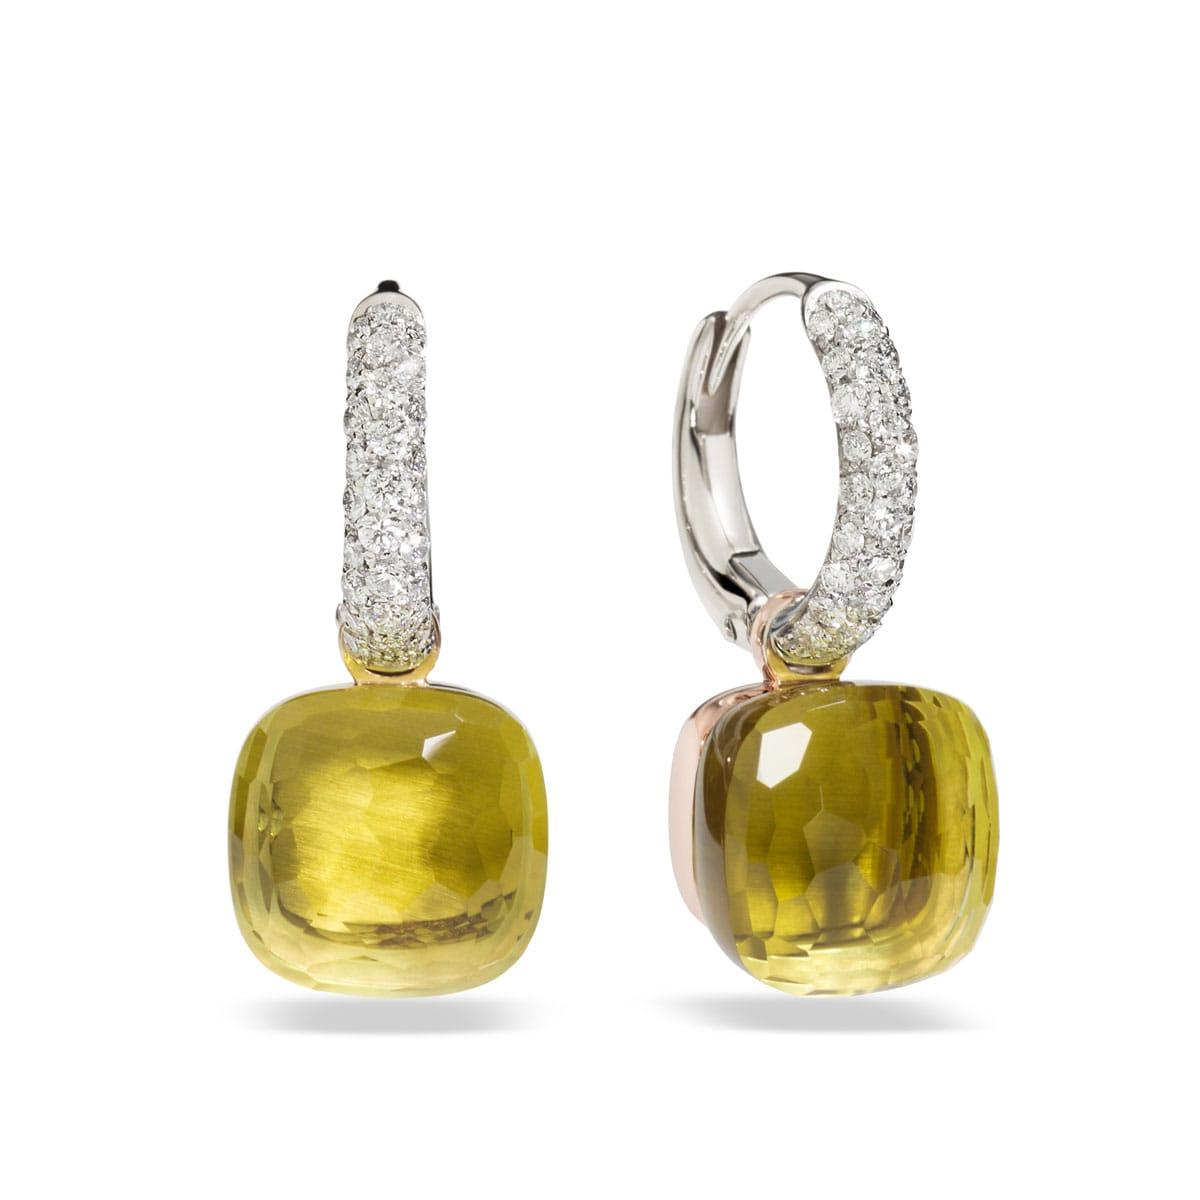 Pomellato-Nudo-boucles-d-oreilles-quarz-lemon-O.B401-B9O6QL Lionel Meylan Horlogerie Joaillerie Vevey